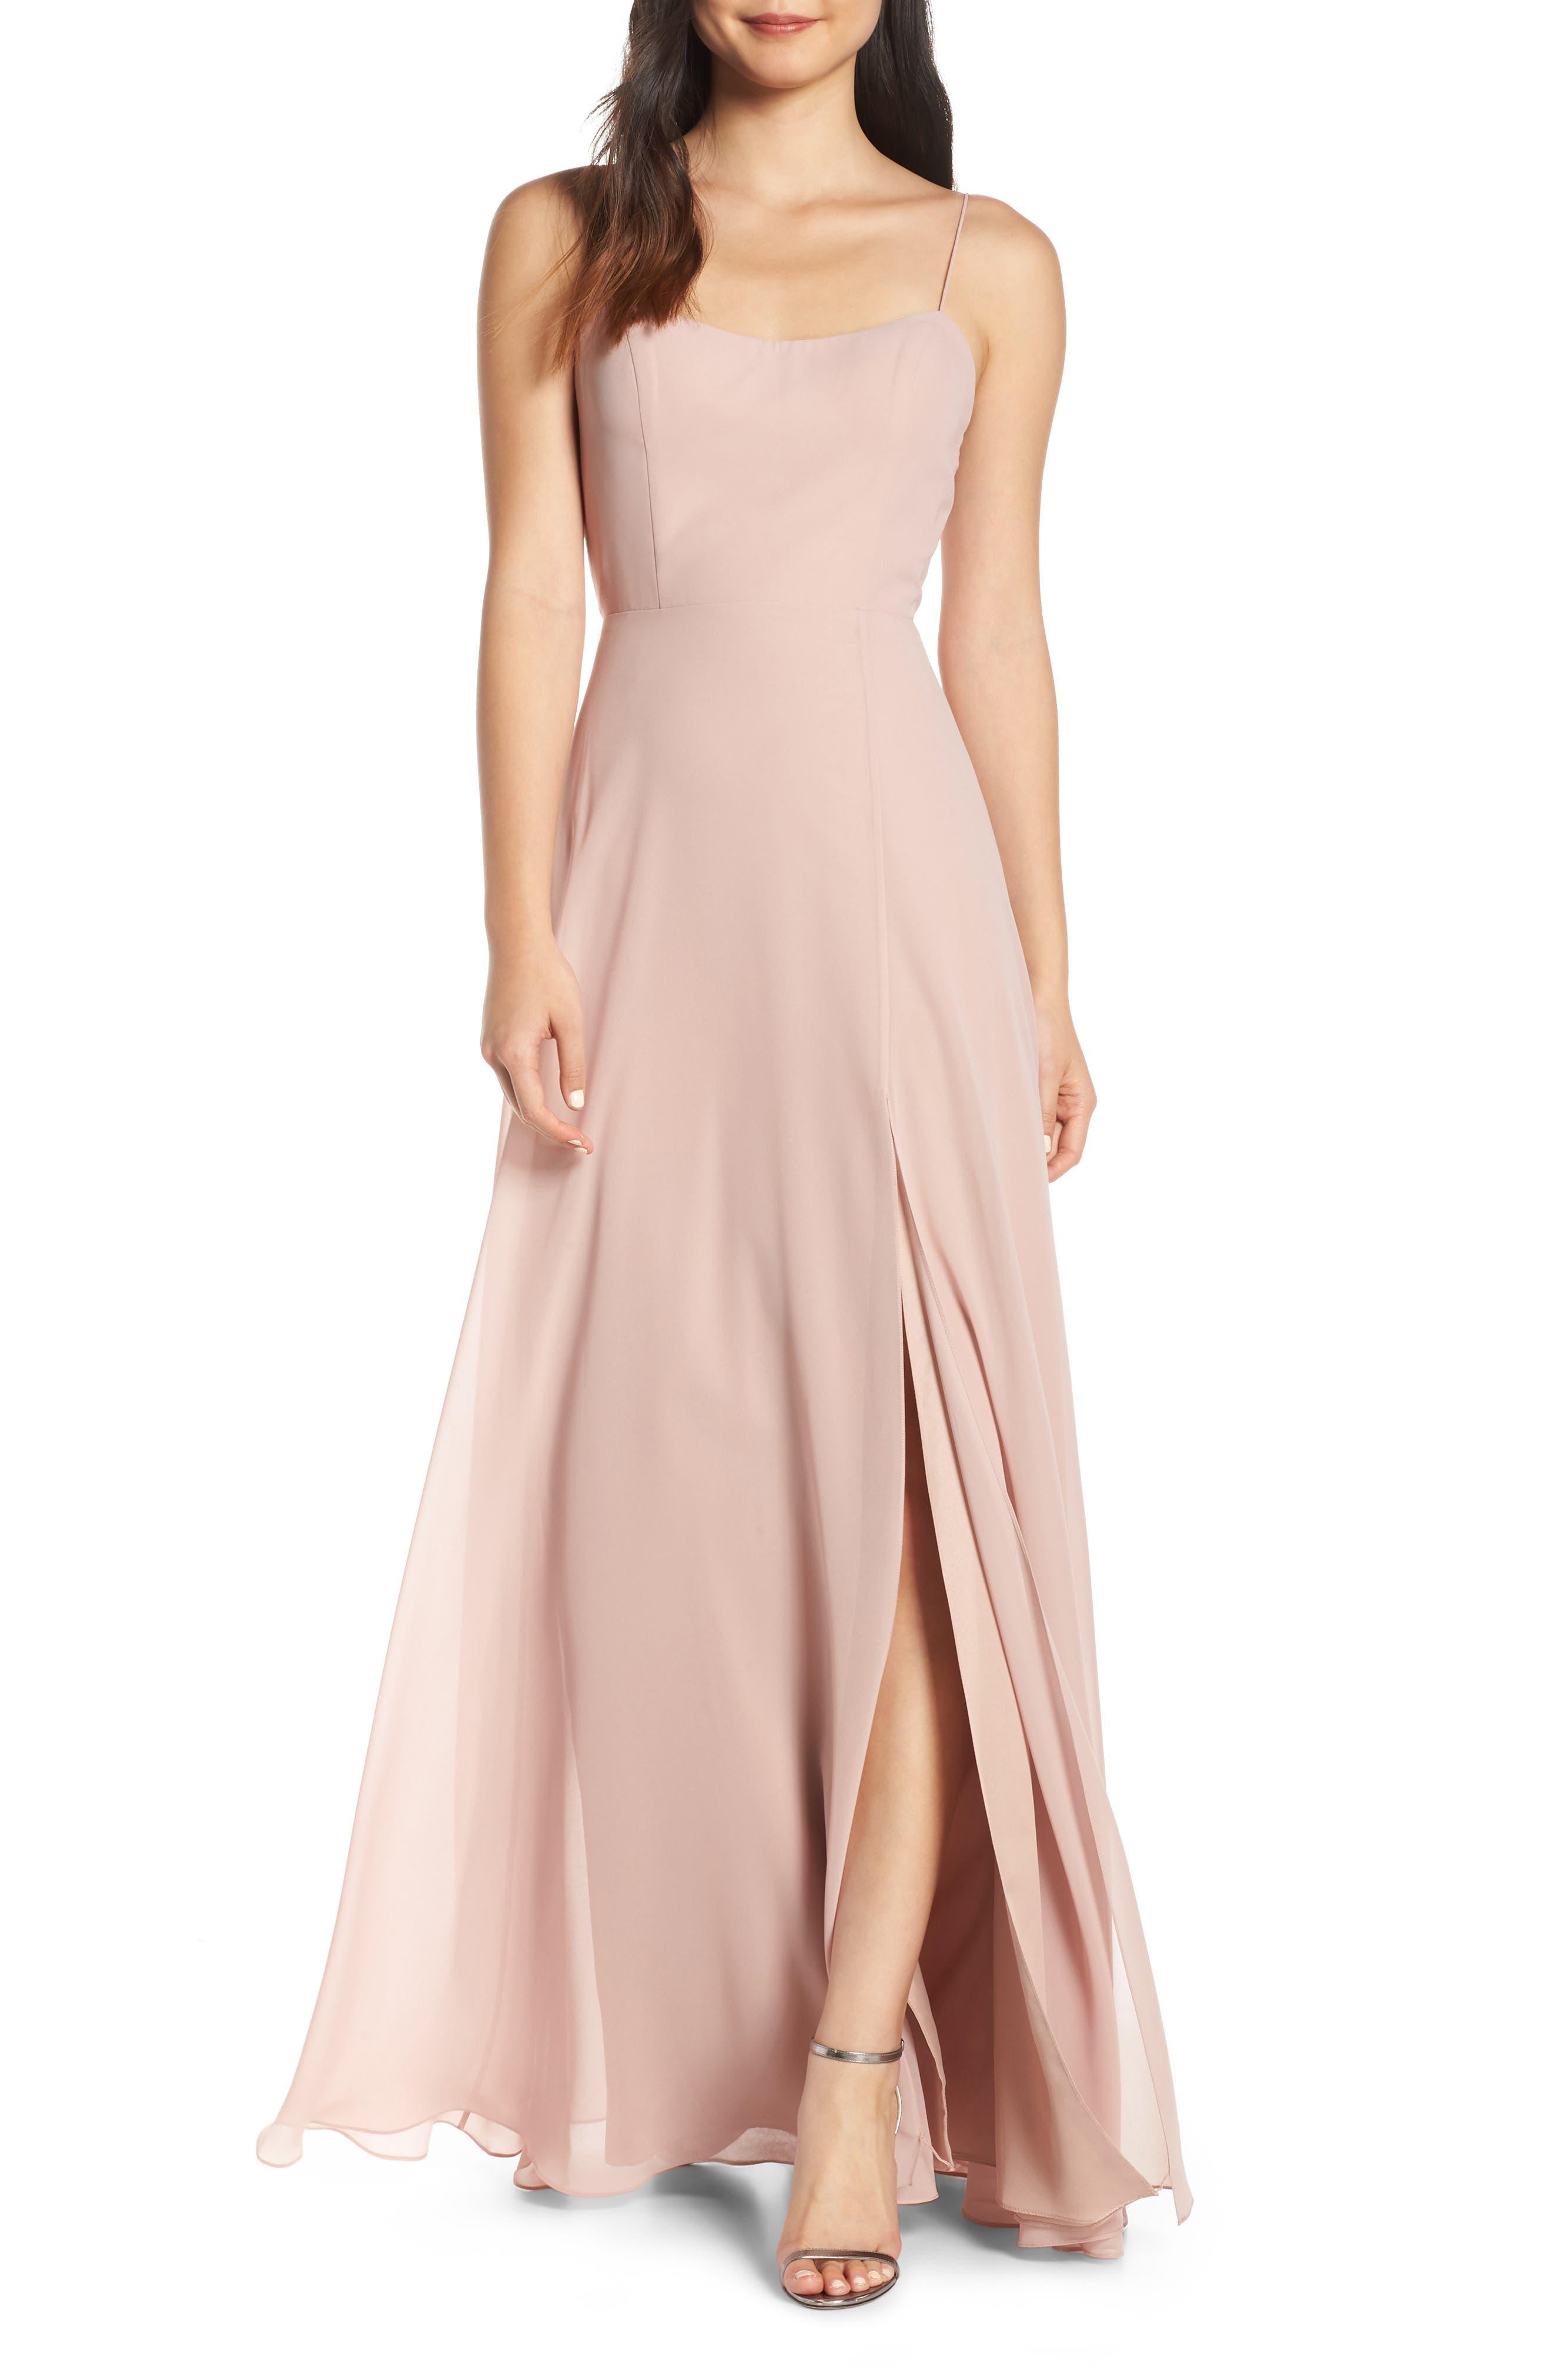 Jenny Yoo Kiara Bow Back Chiffon Evening Dress, Pink